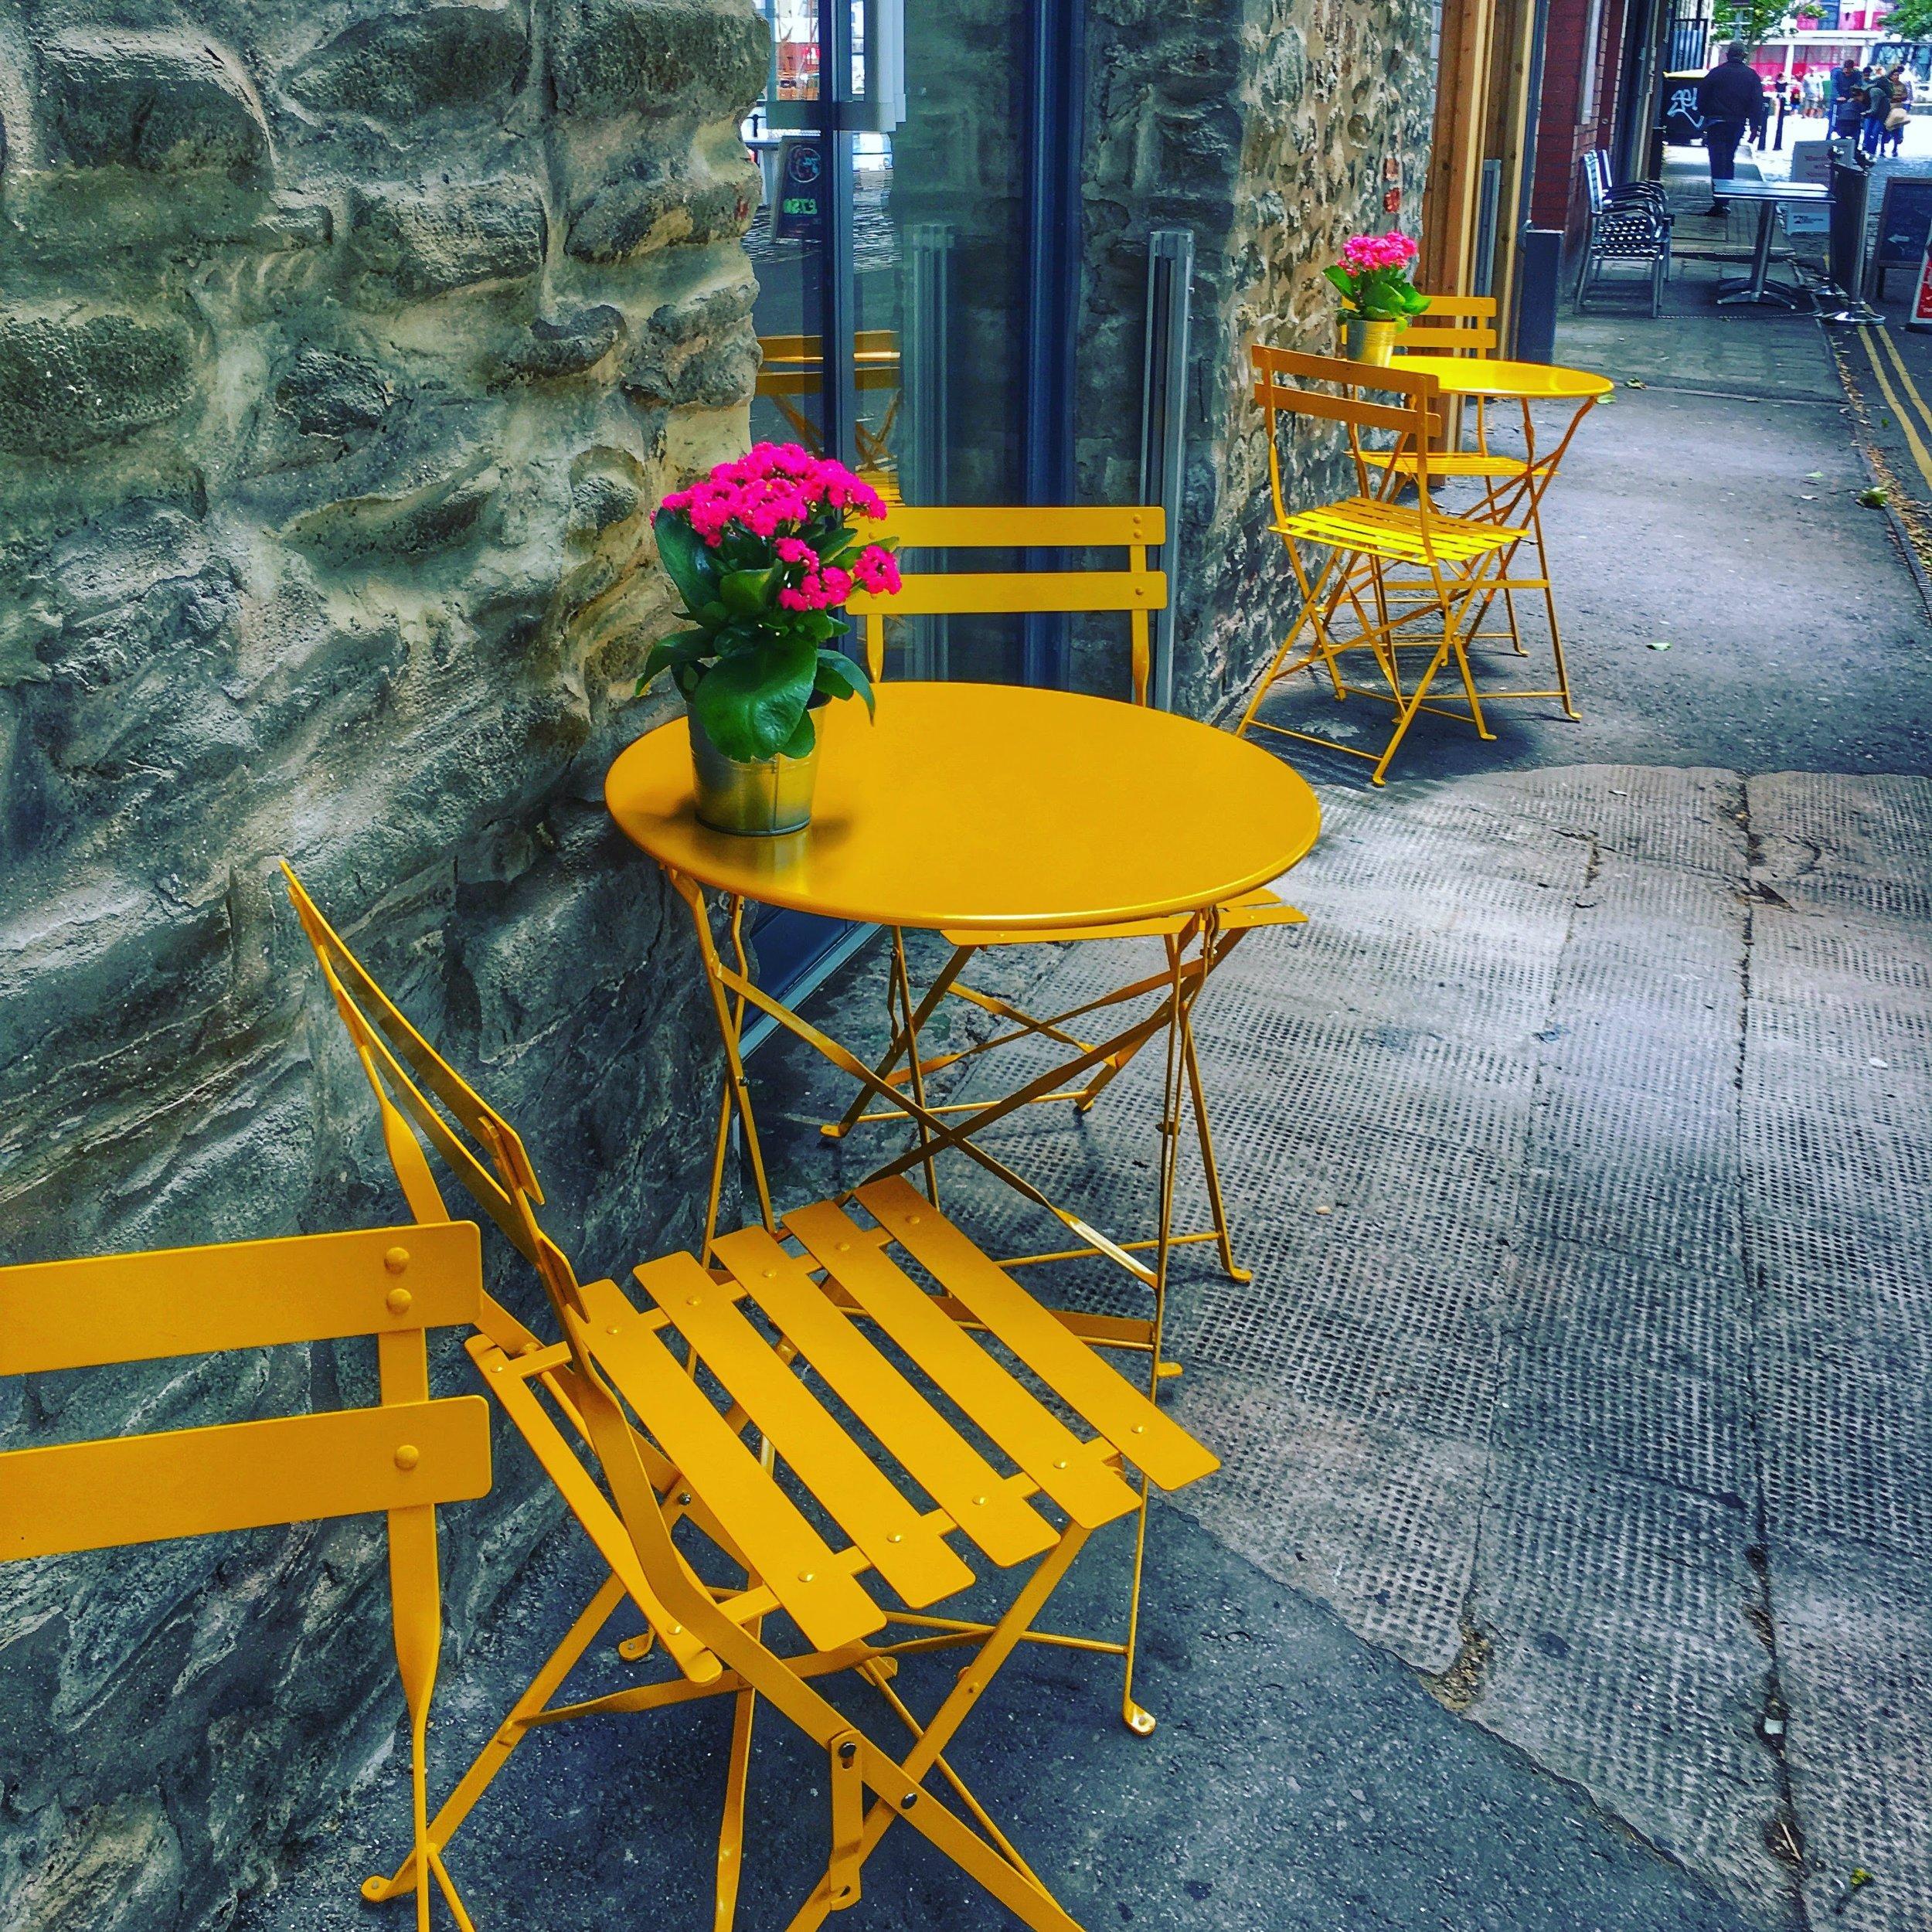 Outside Society Cafe